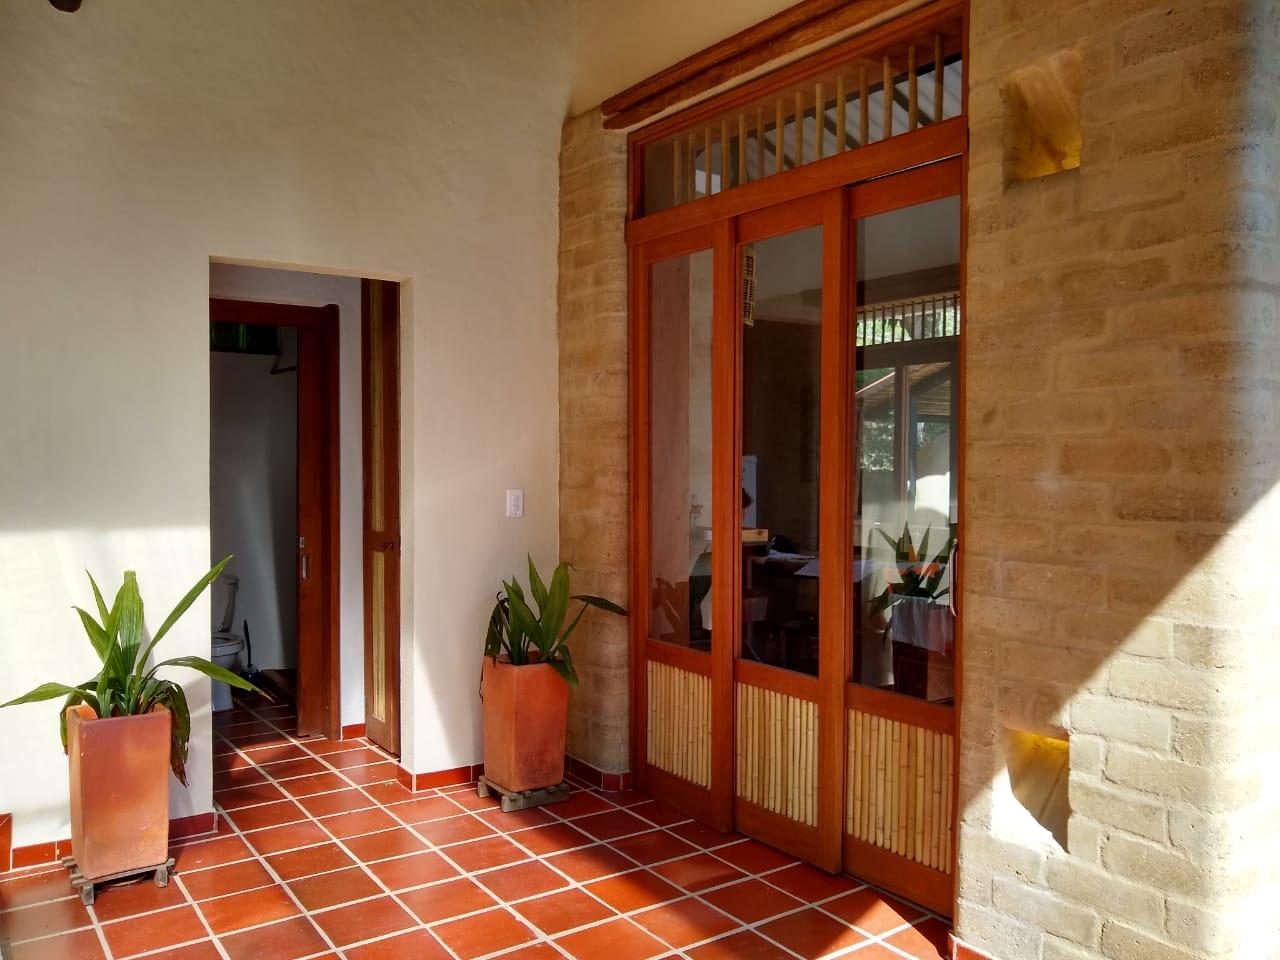 Casa Carolina y Stephanne - La Vega, Cundinamarca1